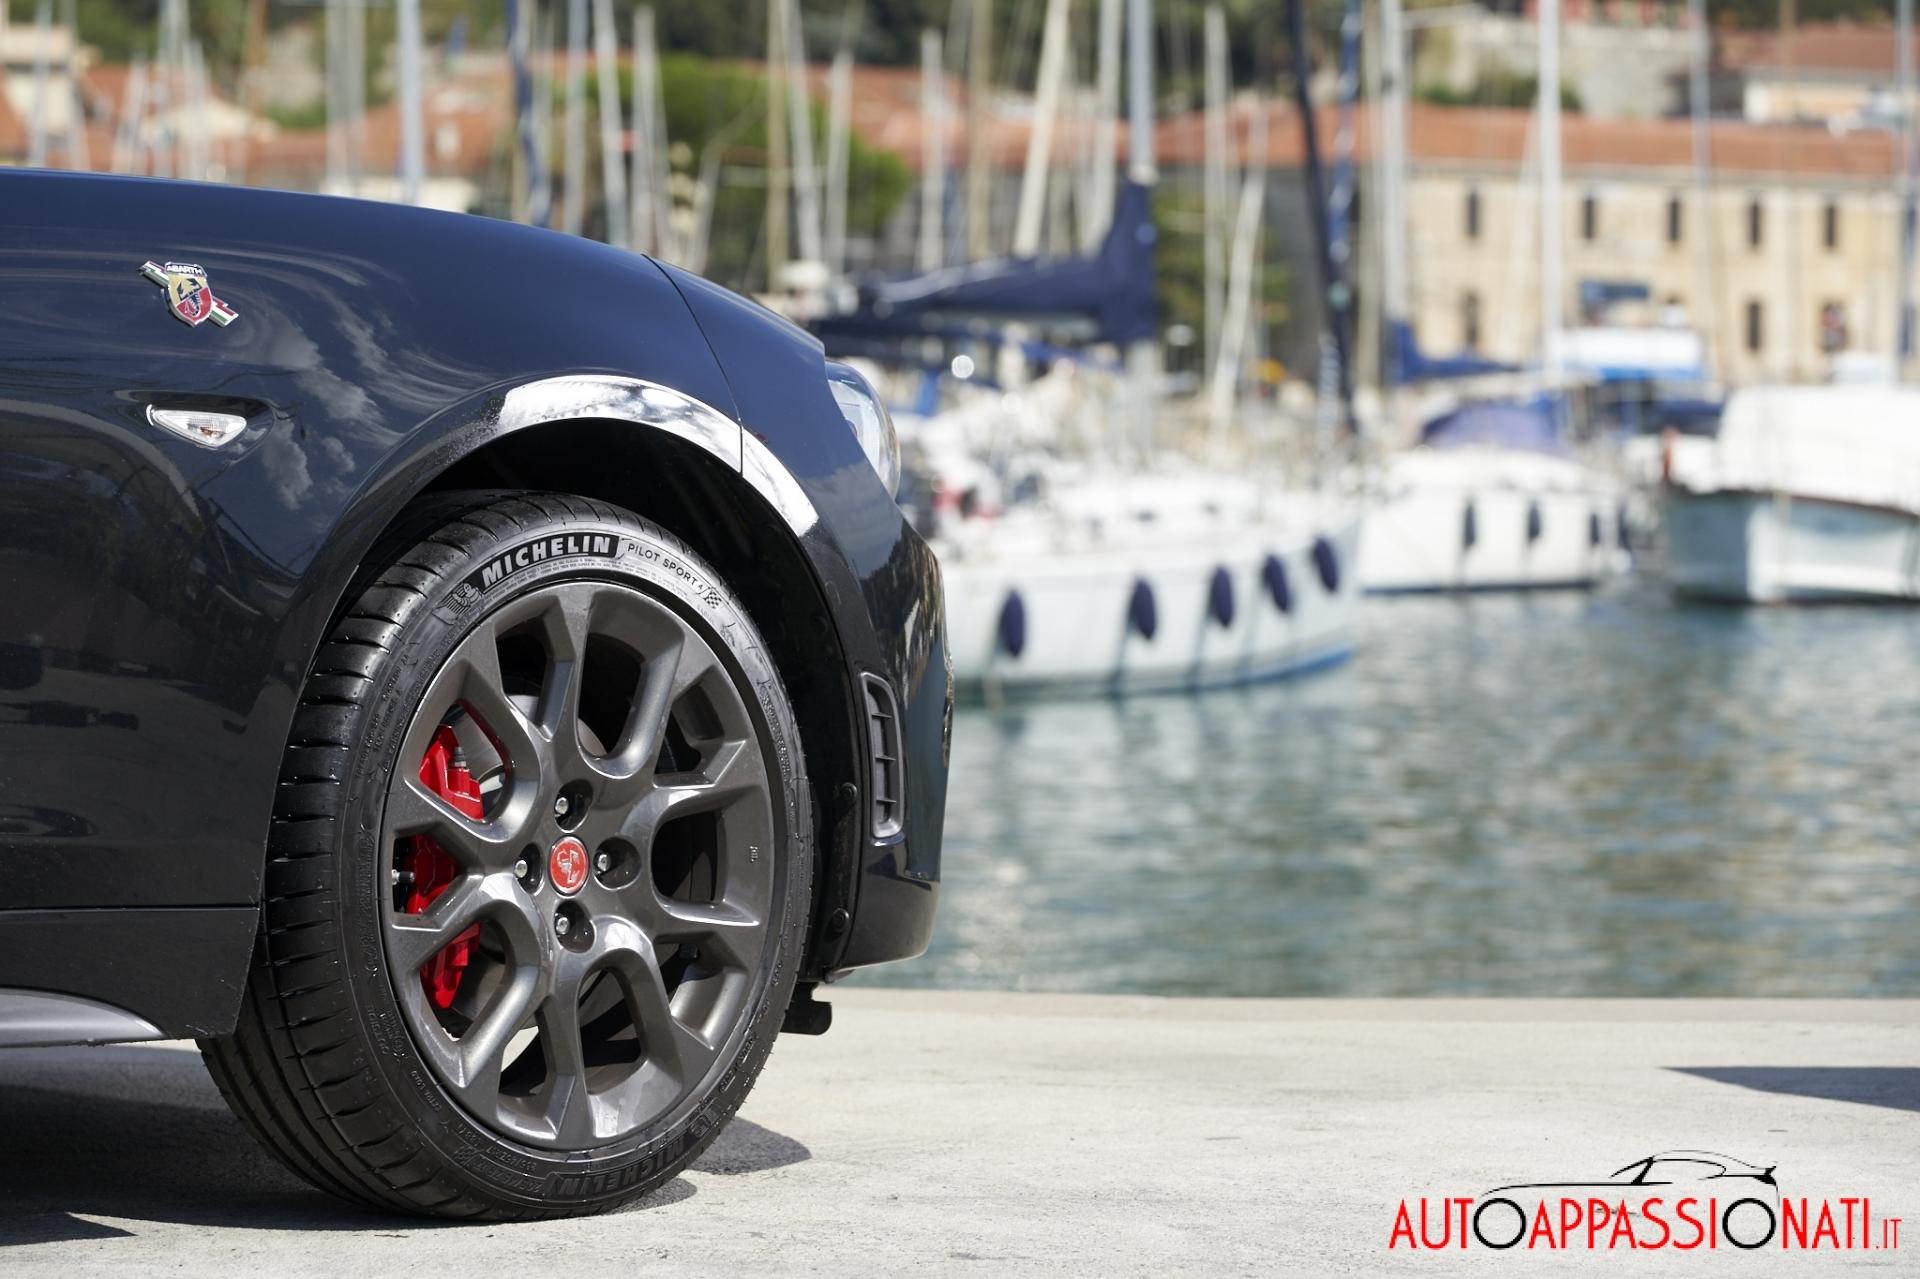 Pneumatici Michelin Pilot Sport 4 205/45